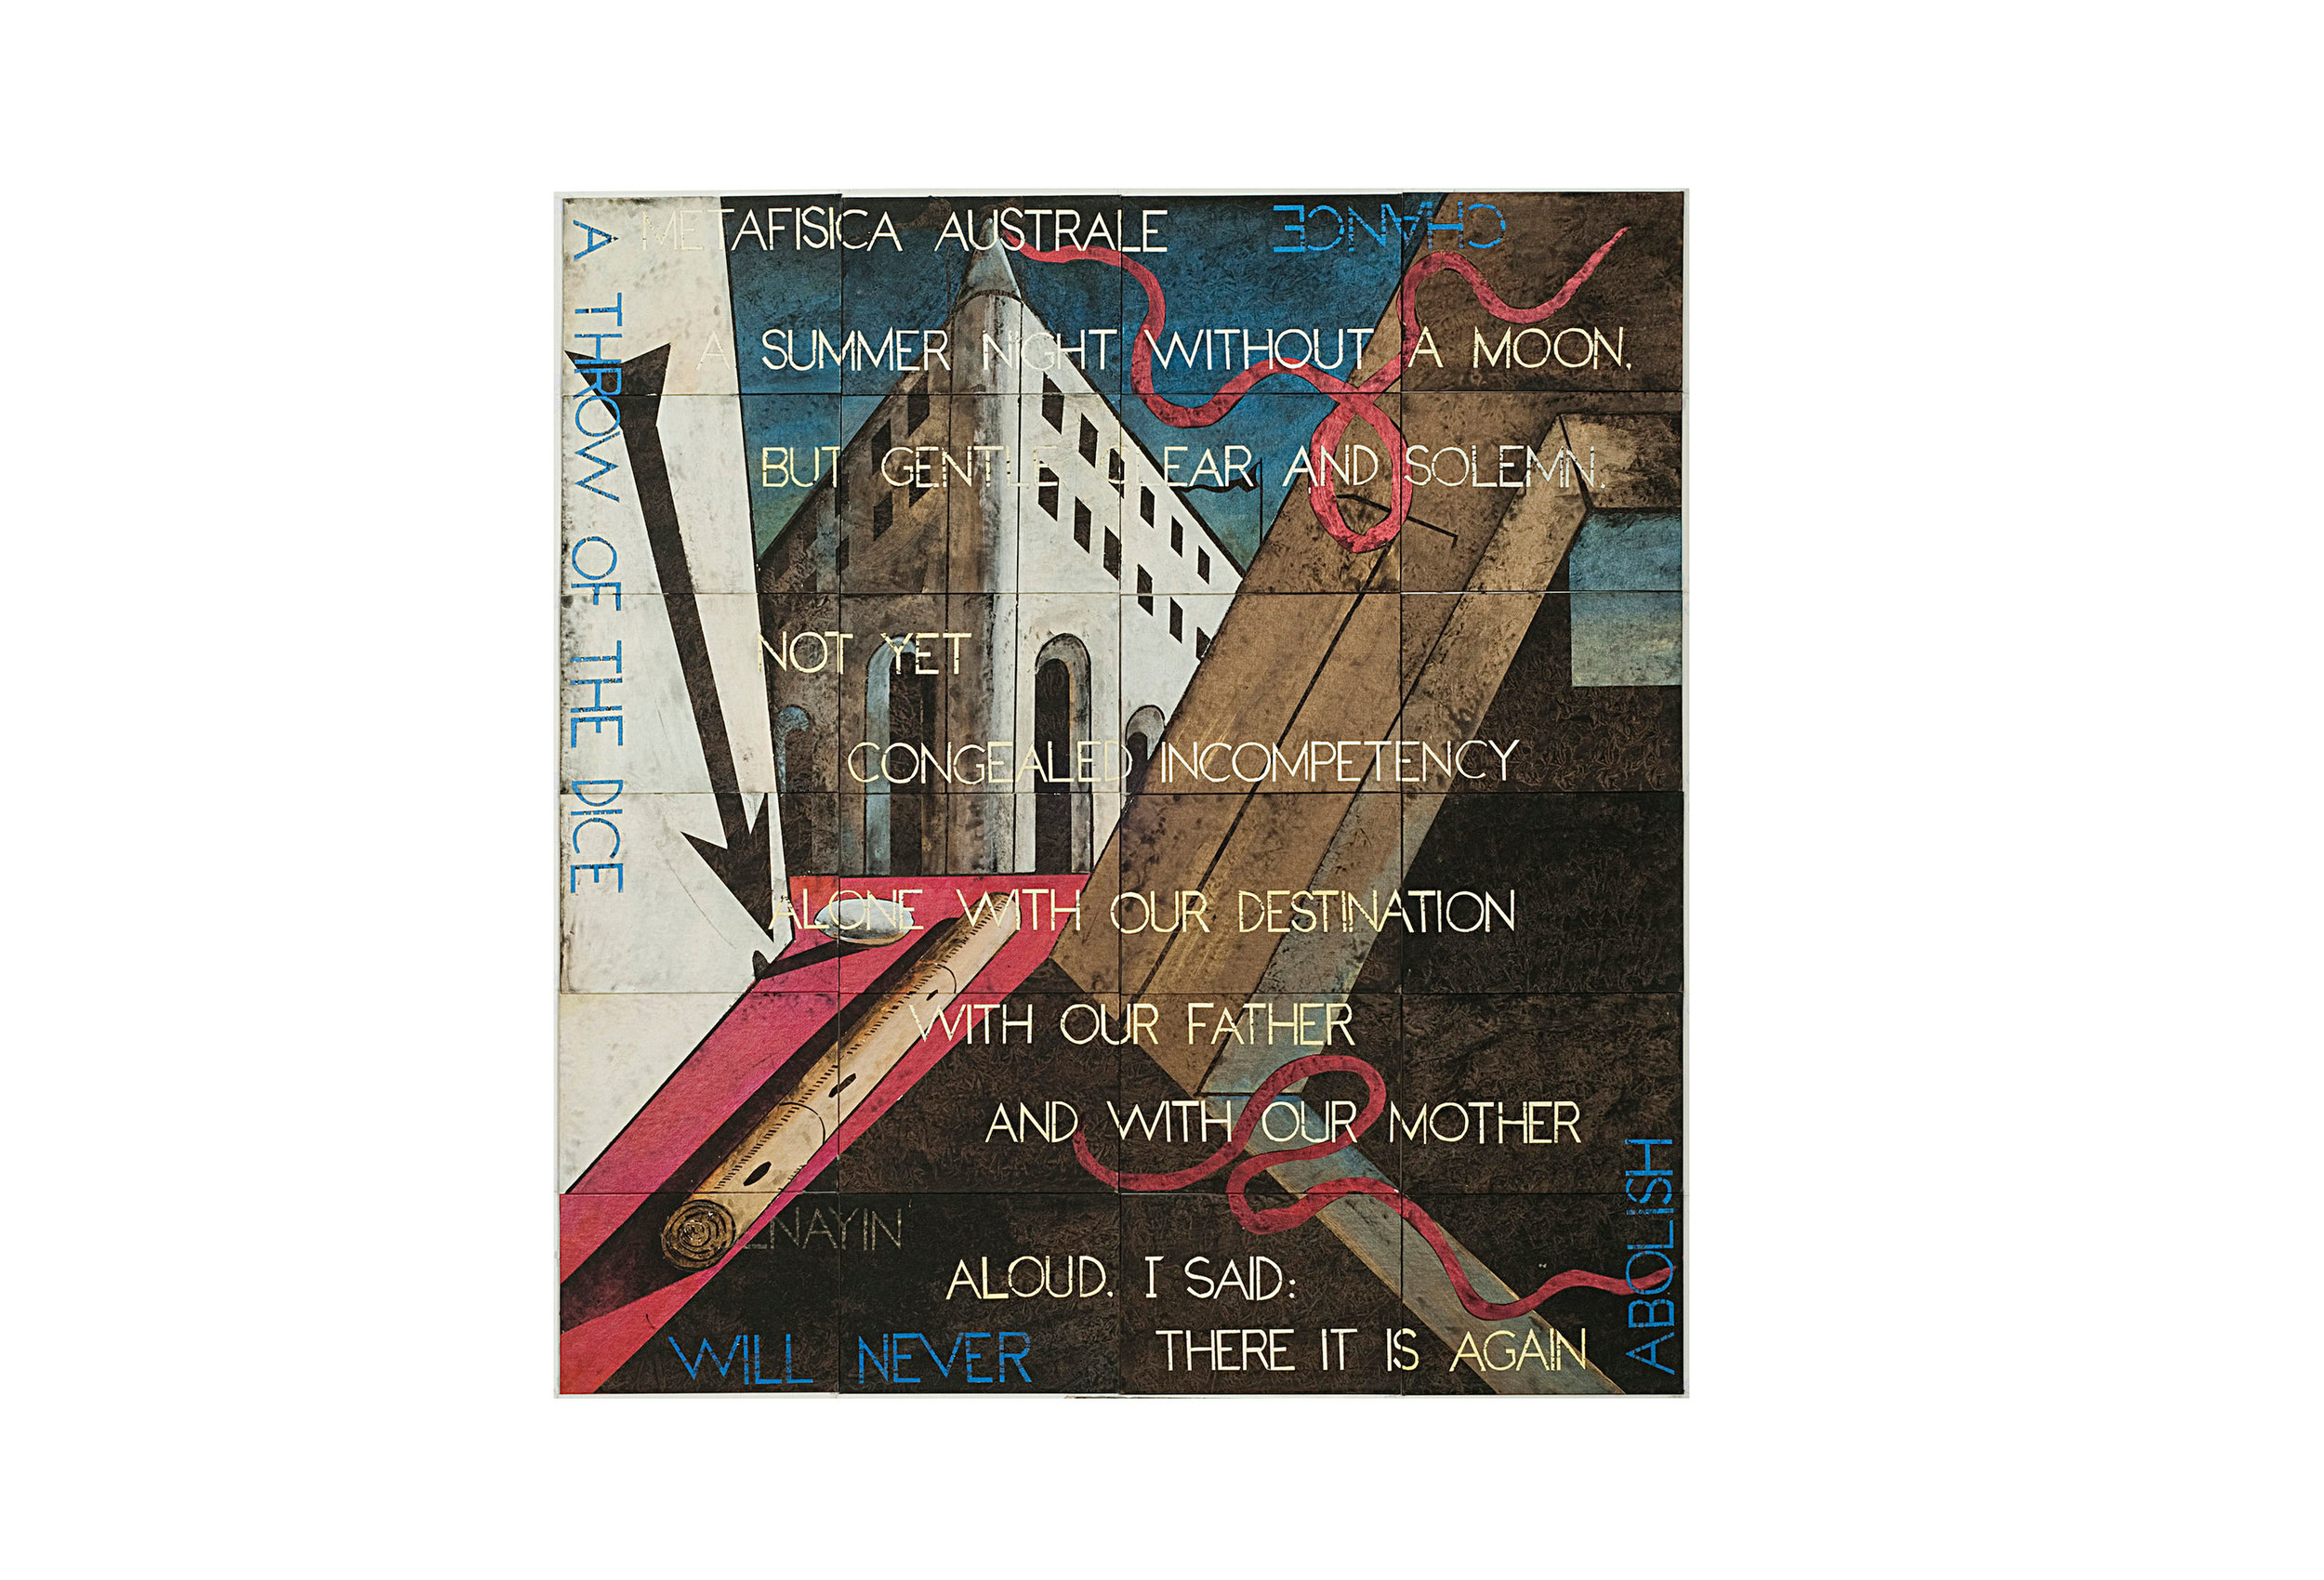 Imants Tillers   Blue Tongue Ancestor , 2014  acrylic, gouache on 24 canvasboards, nos. 95285 - 95308 150.5 × 142.5cm Exhibited:  Imants Tillers: Metafisica Australe , Roslyn Oxley9 Gallery, Sydney, 2014